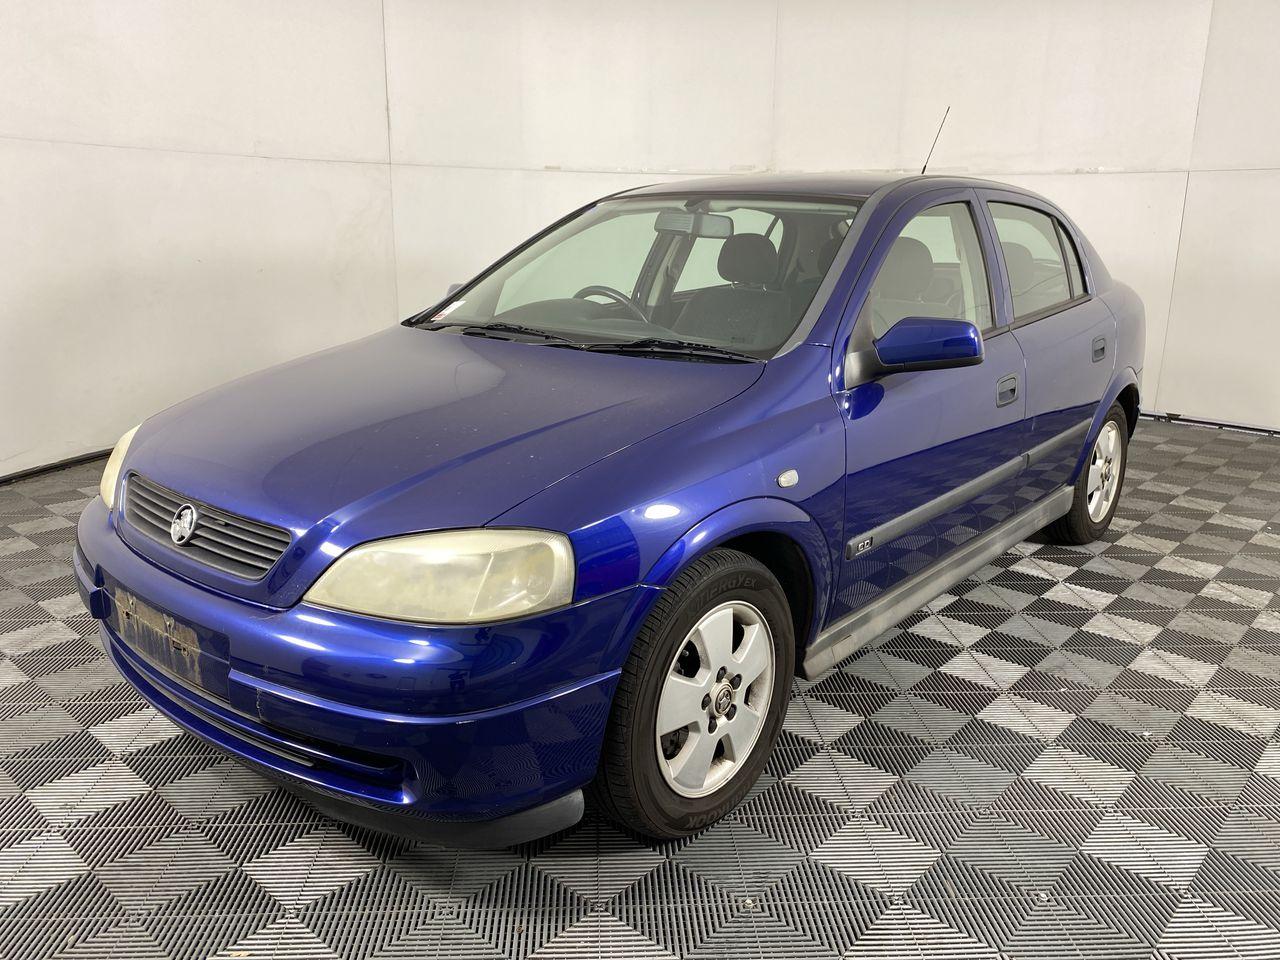 2004 Holden Astra CD TS Hatchback 84,147 km's (Servicere History)